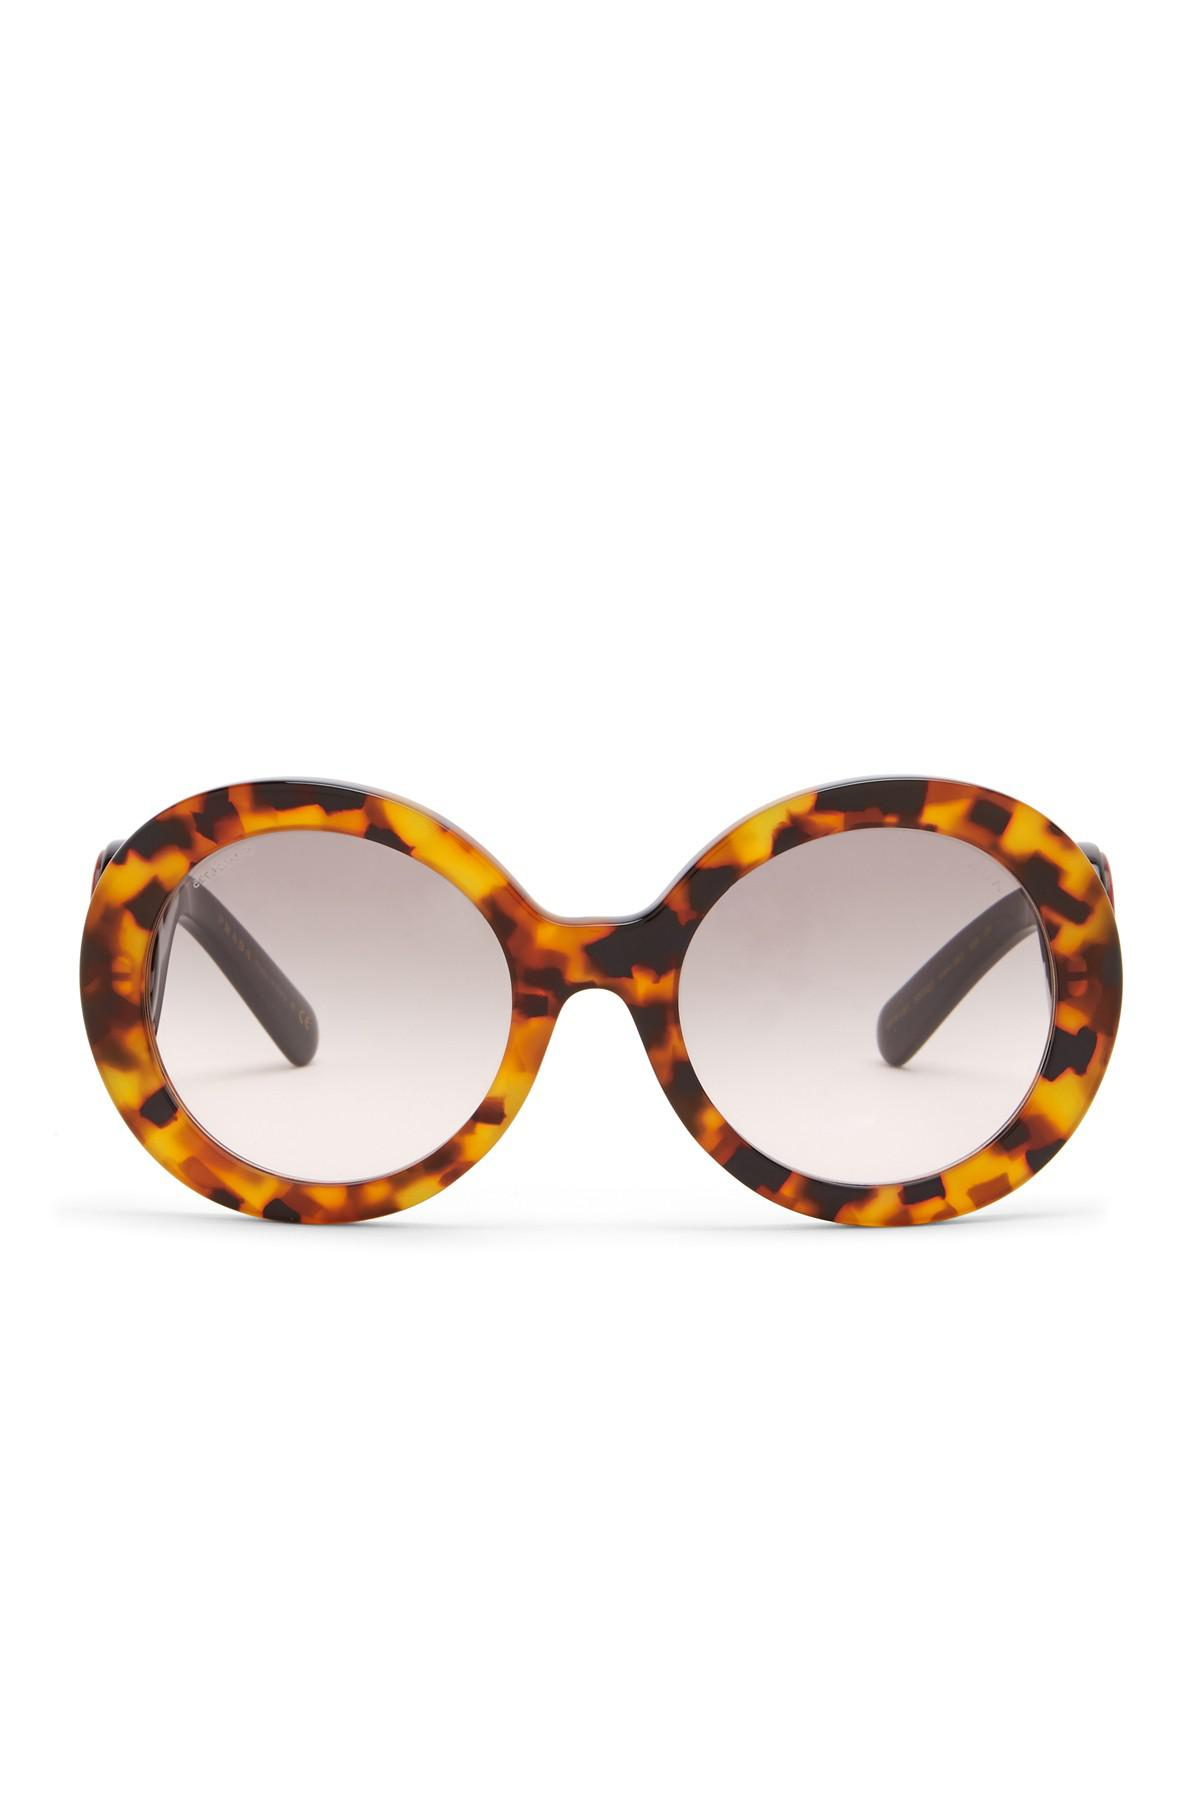 59d1be3b85 ... new zealand lyst prada womens 55mm round catwalk minimal baroque  sunglasses ea3e5 aa050